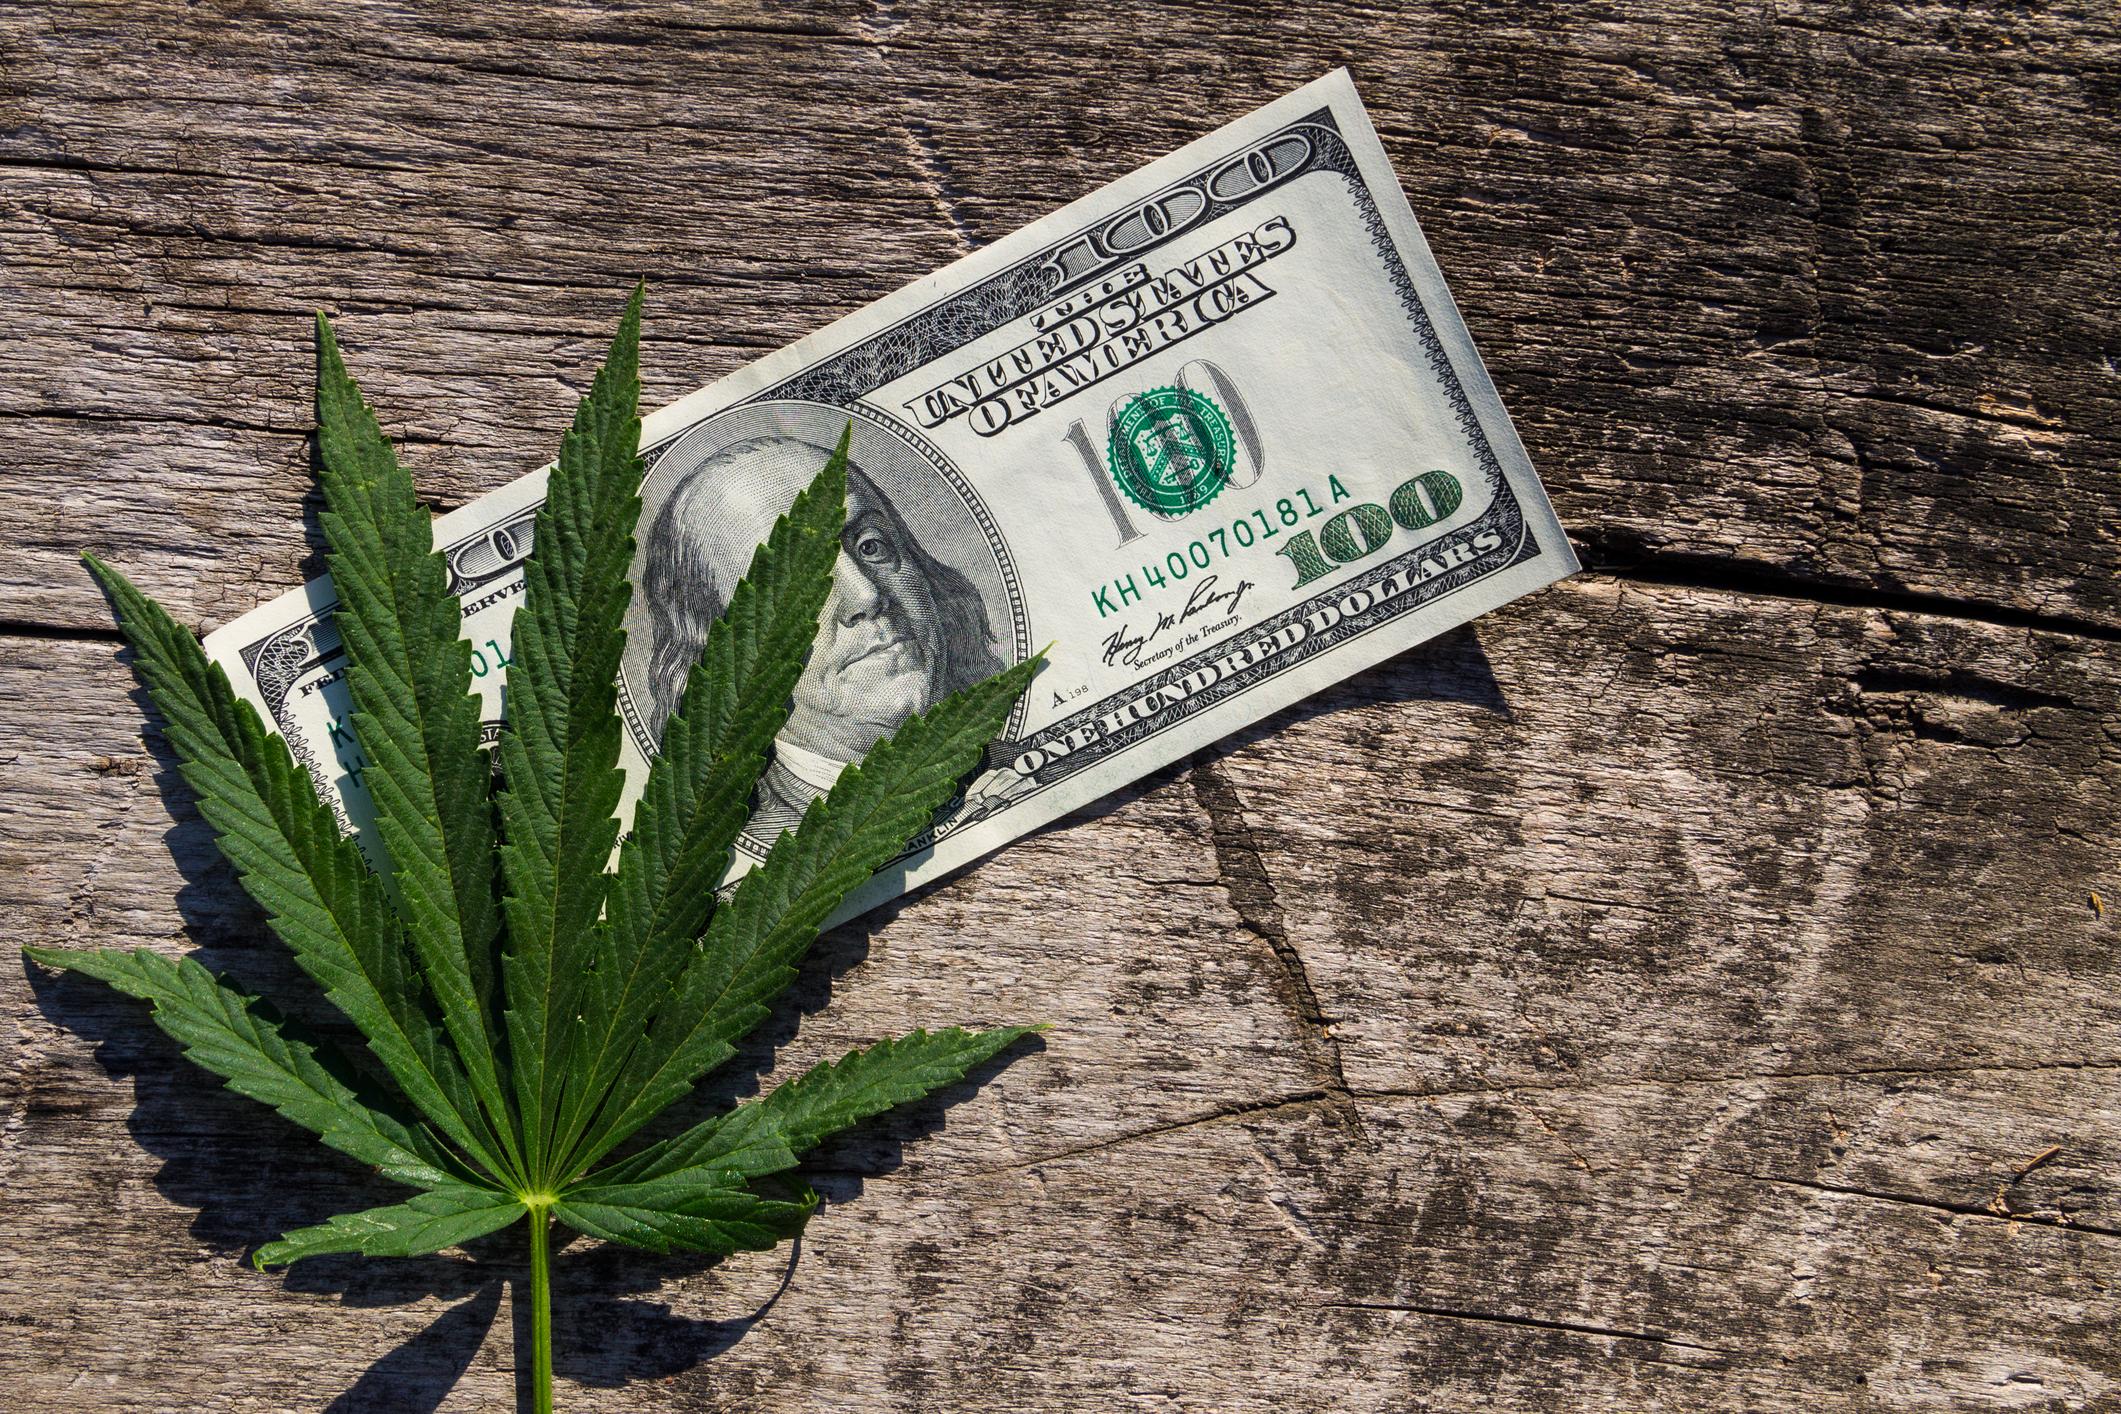 A marijuana leaf on a $100 bill on a table.